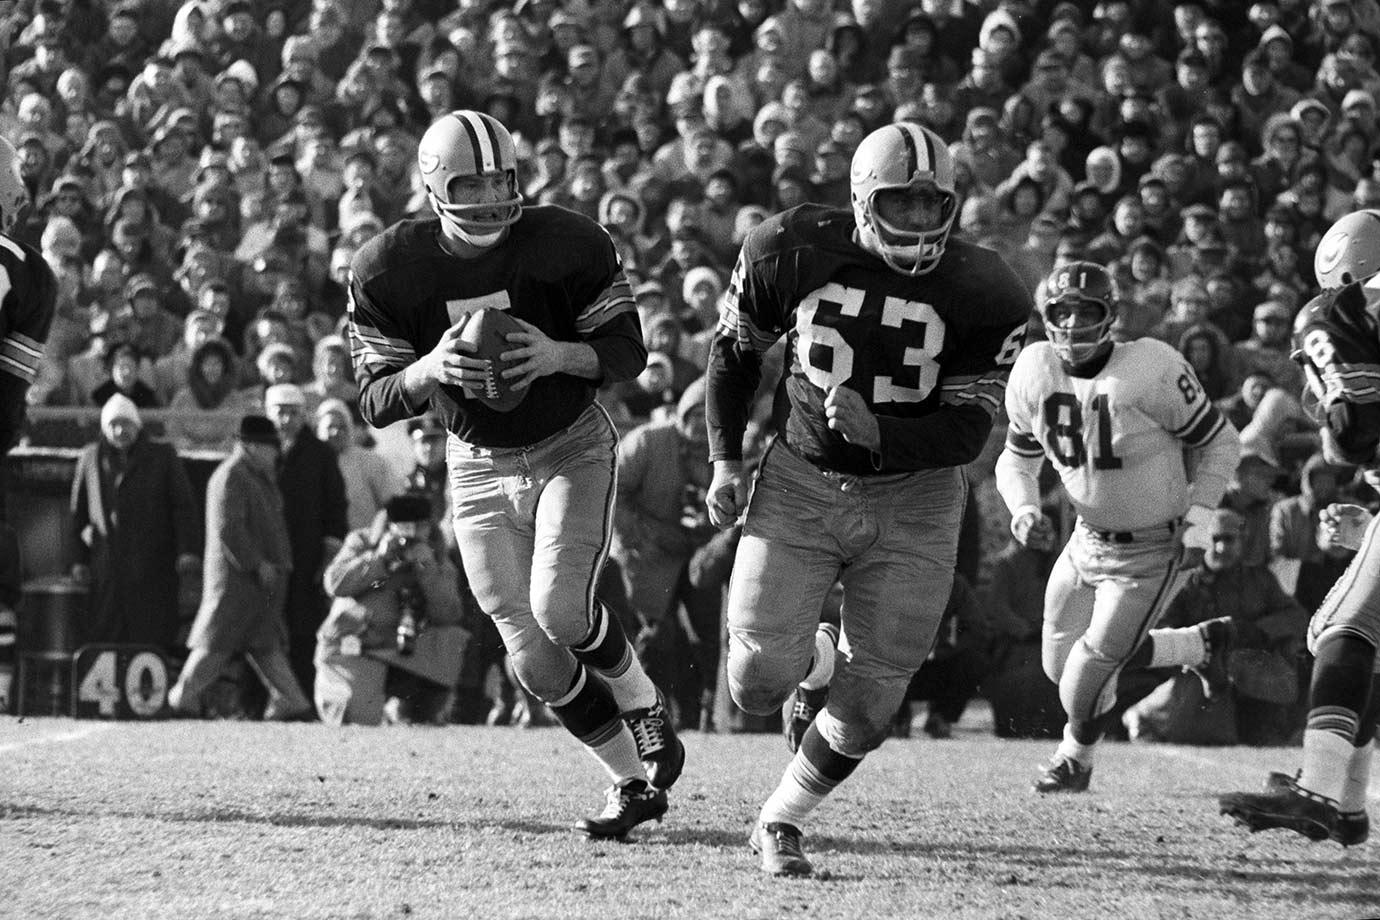 Dec. 31, 1961 (NFL Championship) — Green Bay Packers vs. New York Giants